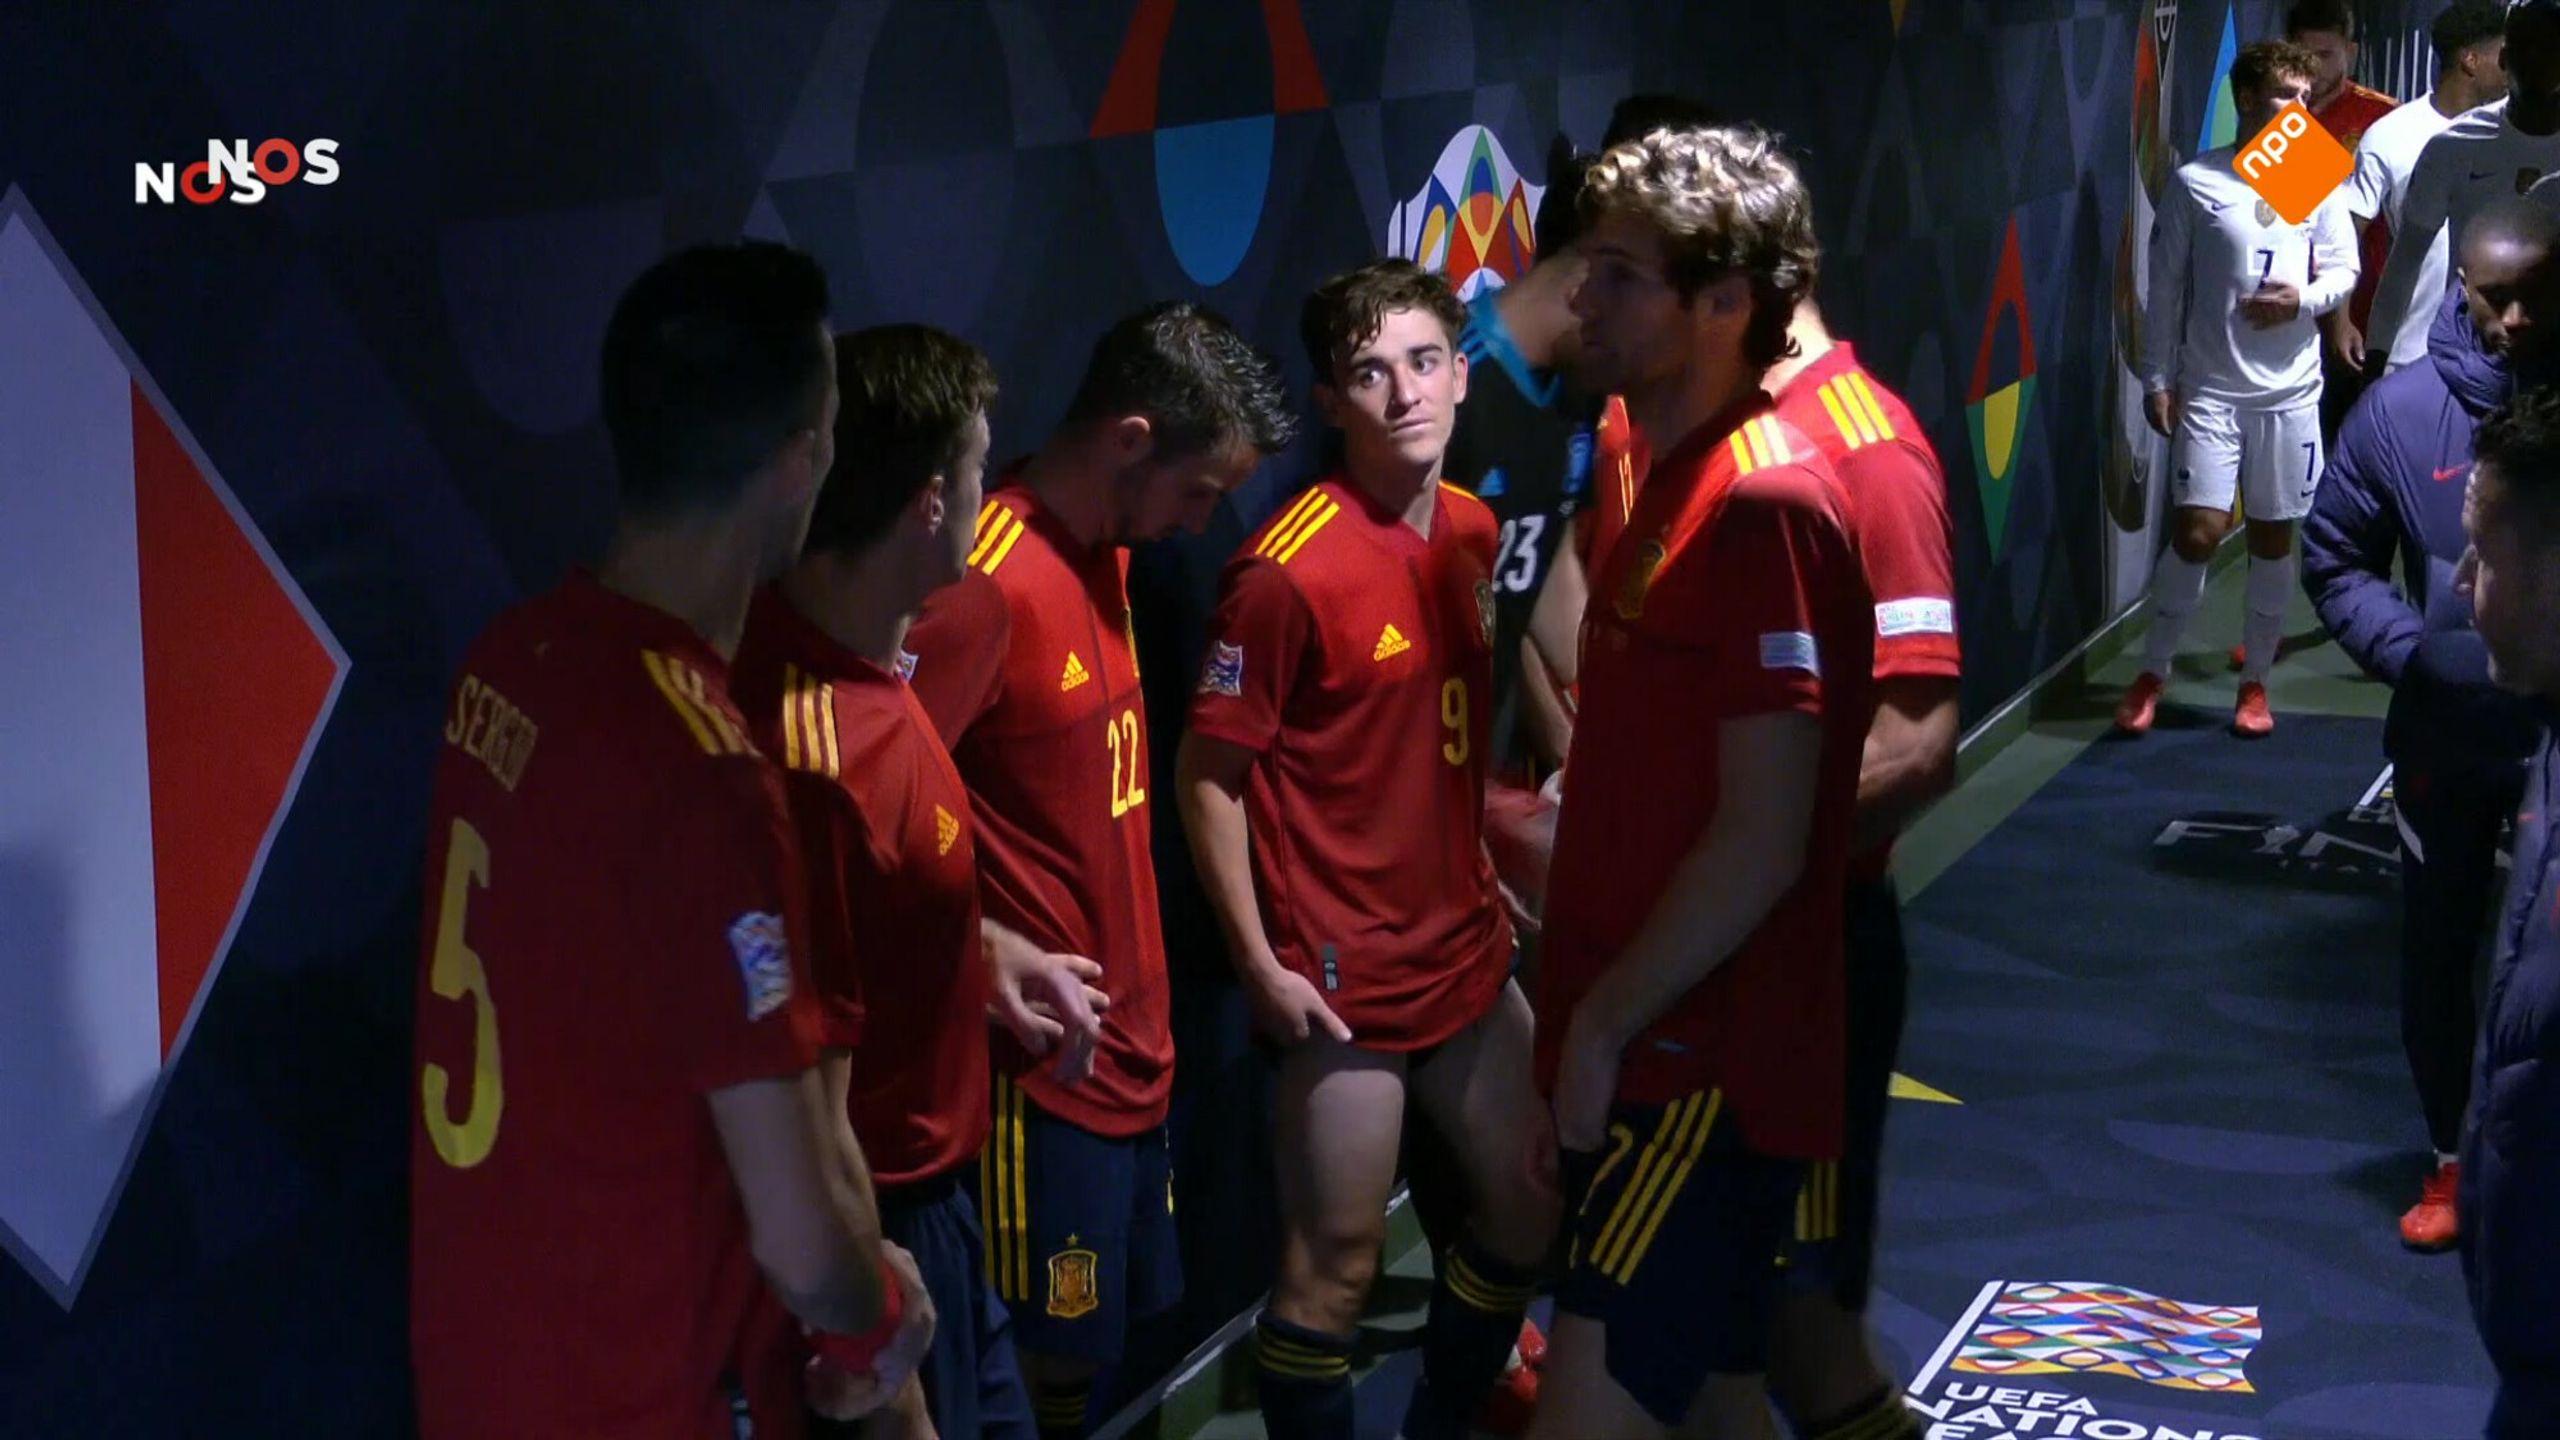 NOS Voetbal Nations League tweede helft